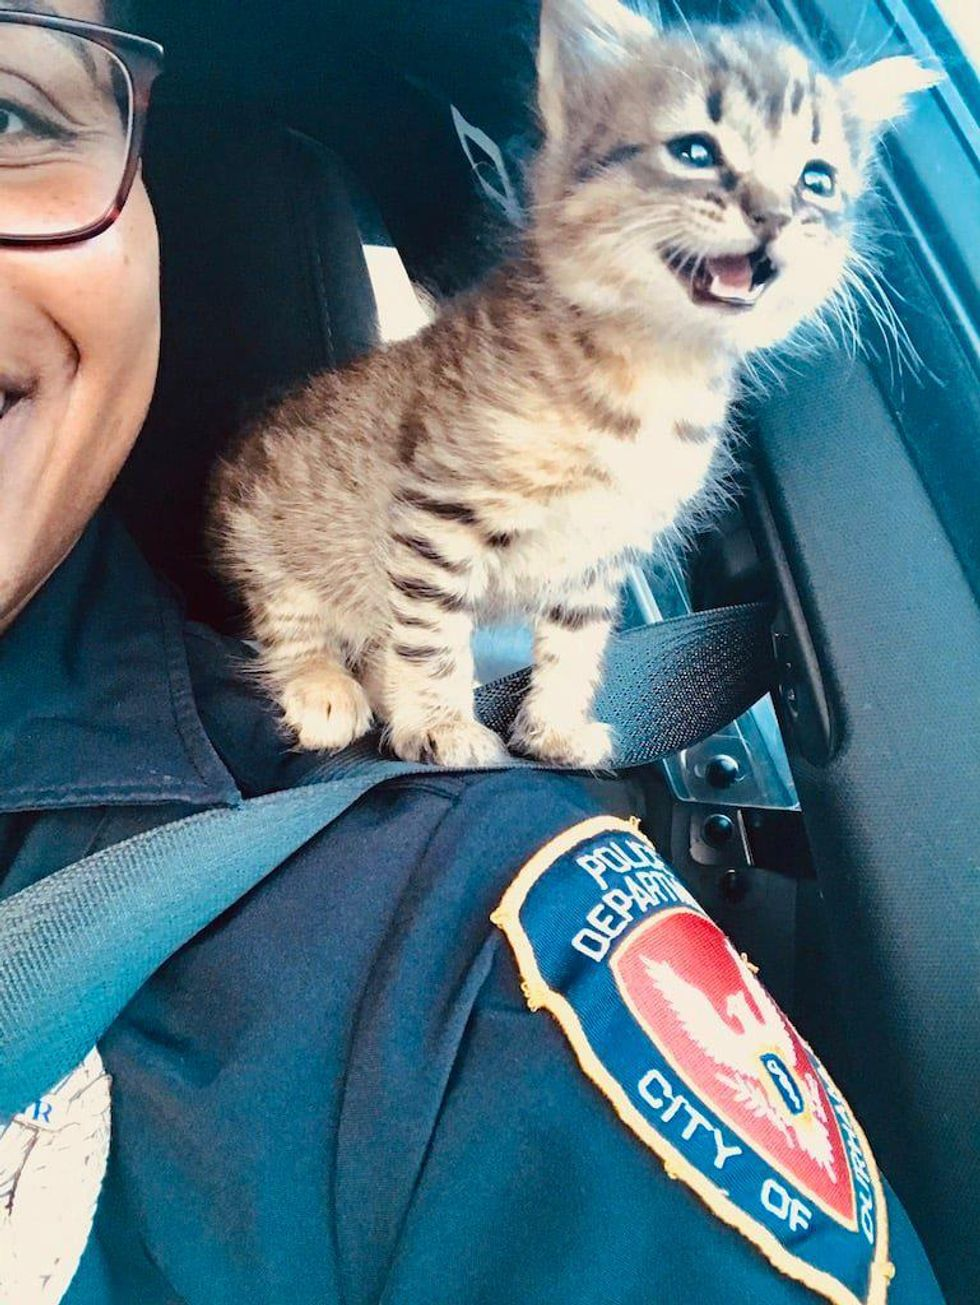 Kitten, cop, durham, rescue, shoulder cat